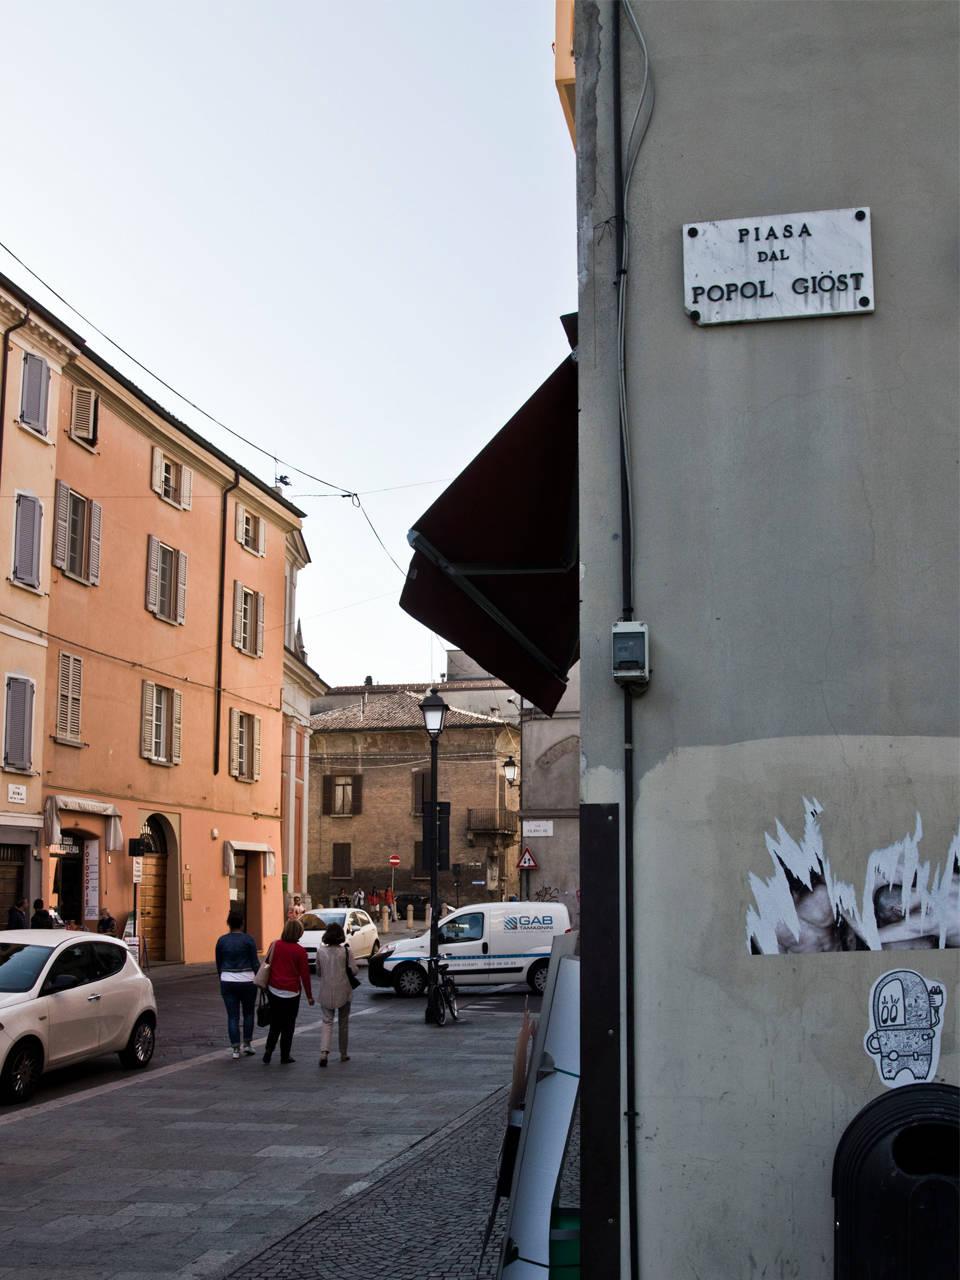 piazza popol giost